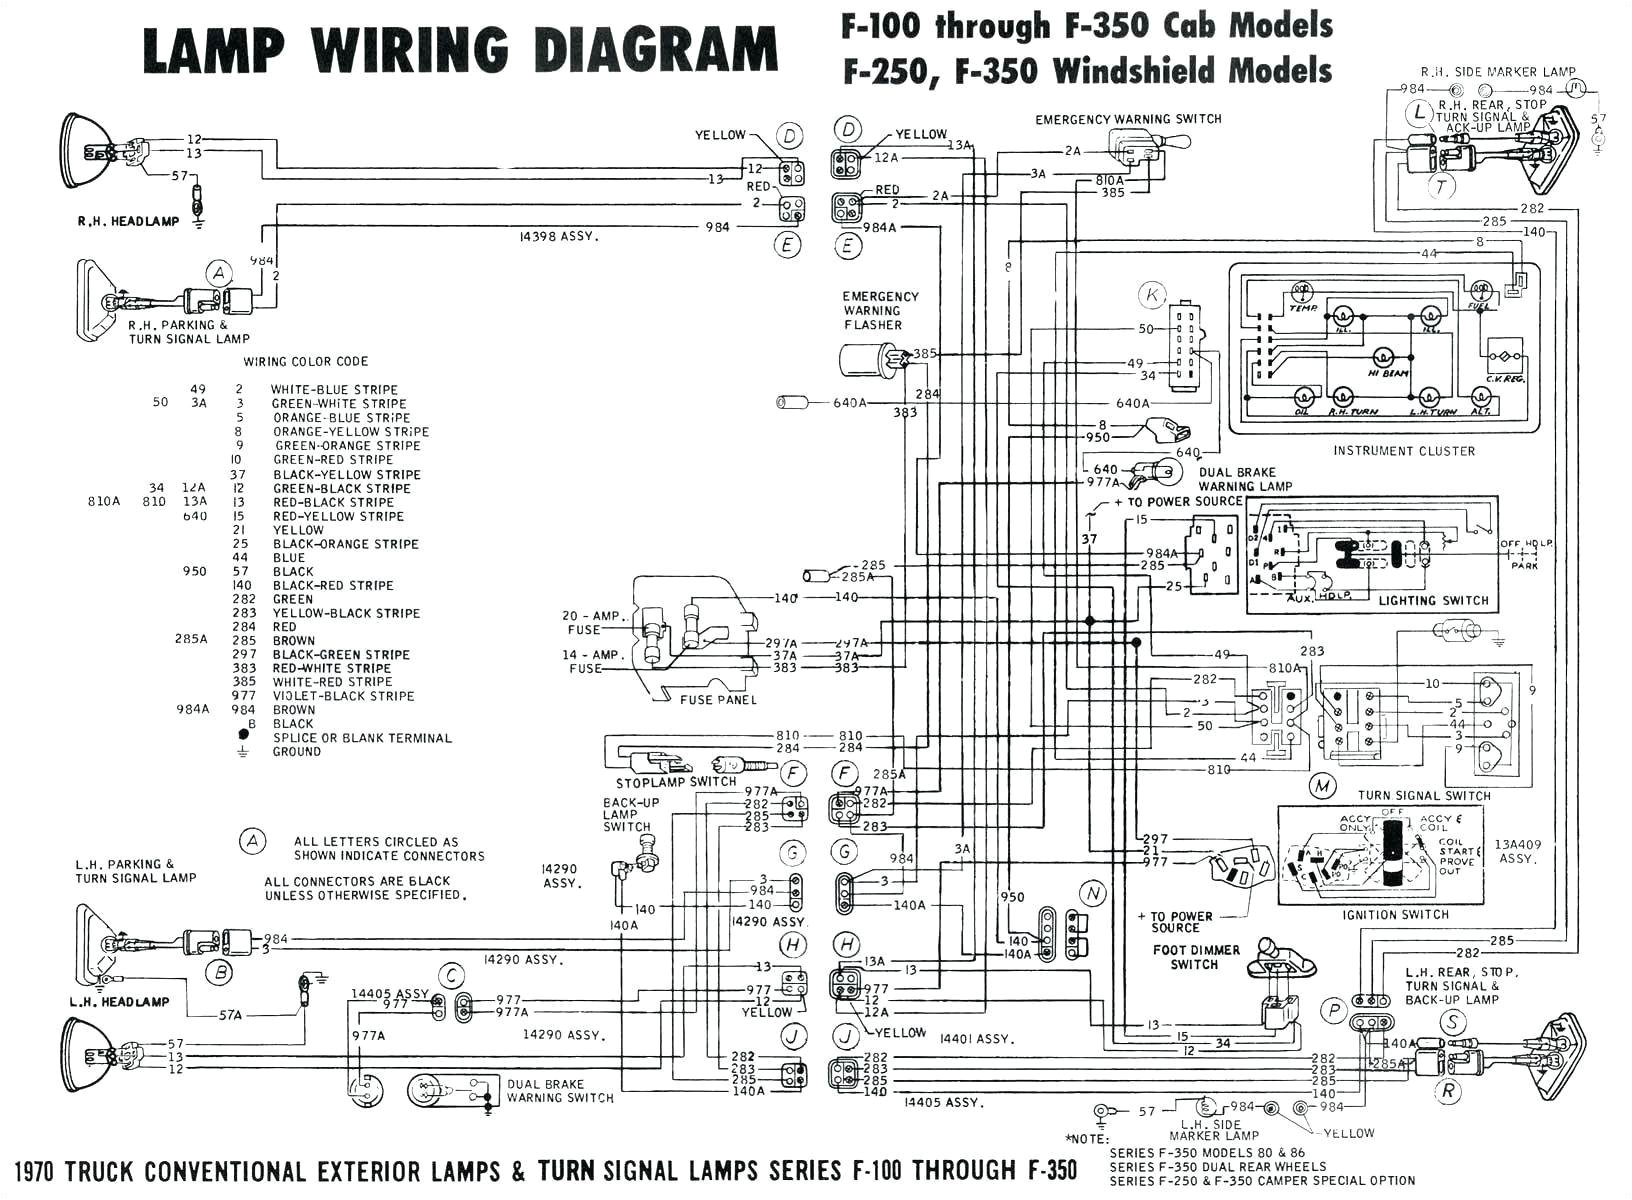 95 dodge truck wiring diagram wiring diagram toolbox 1995 dodge pick up wiring diagram